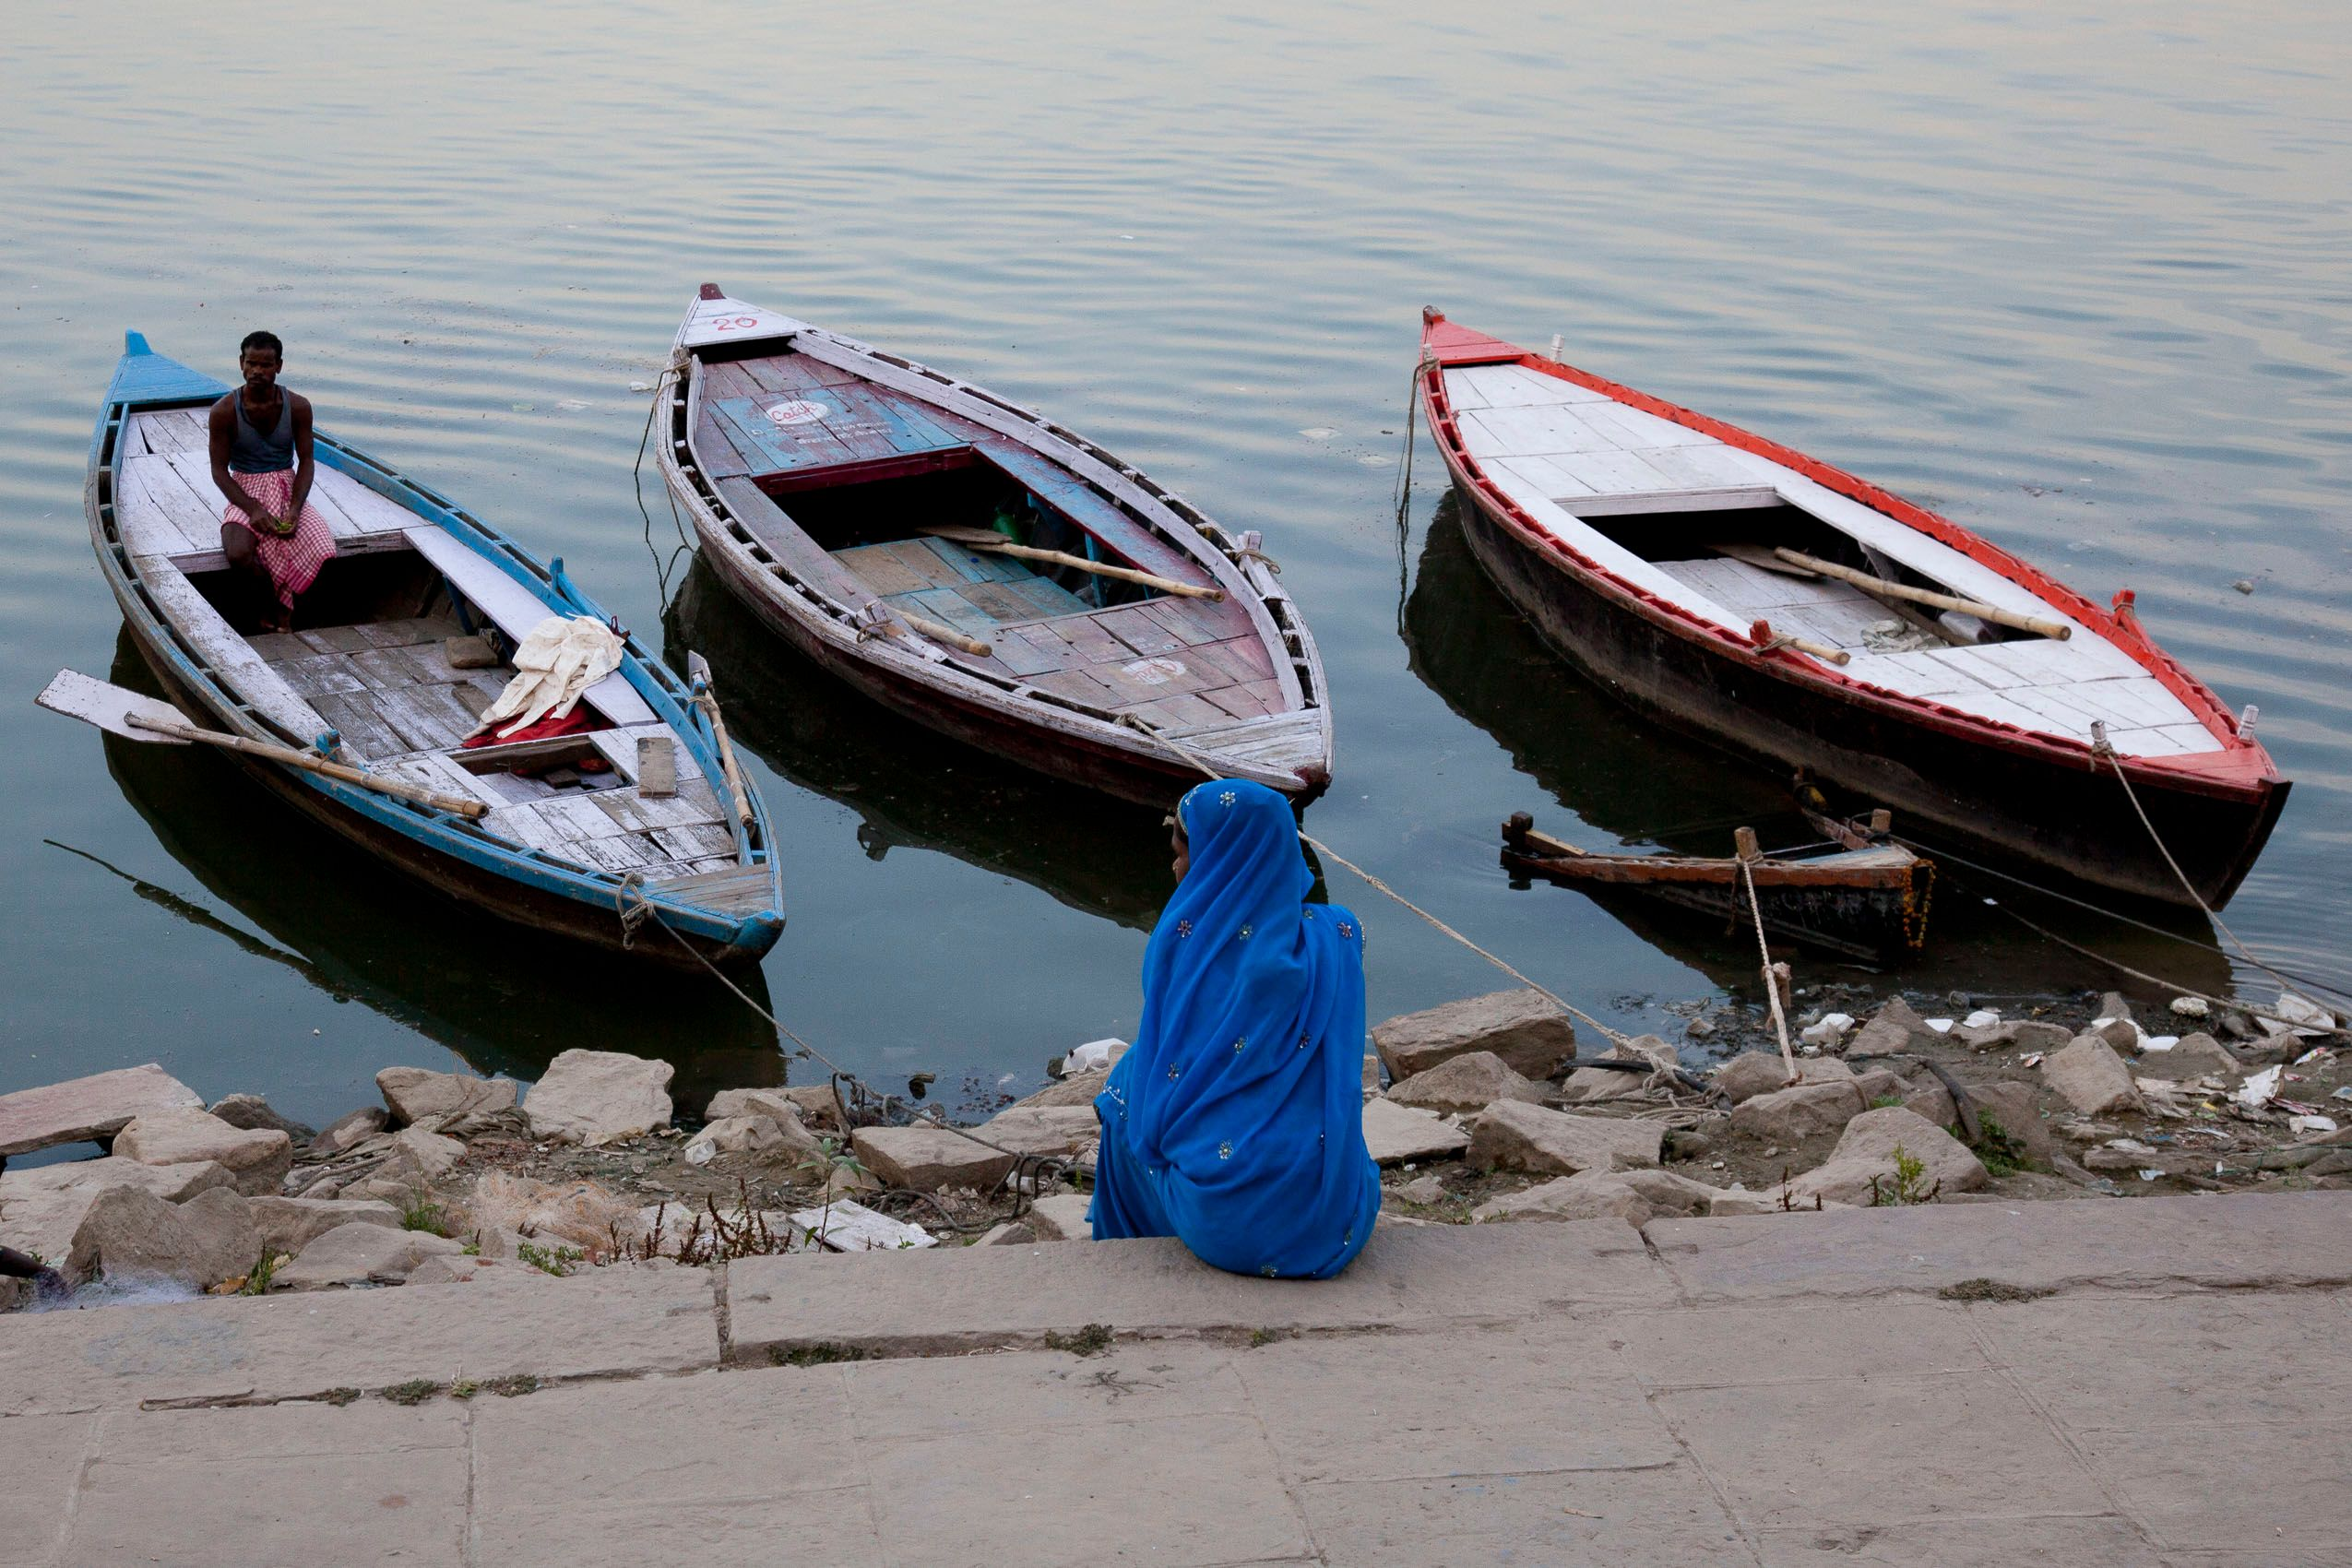 india_varanasi_boats_shore.jpg